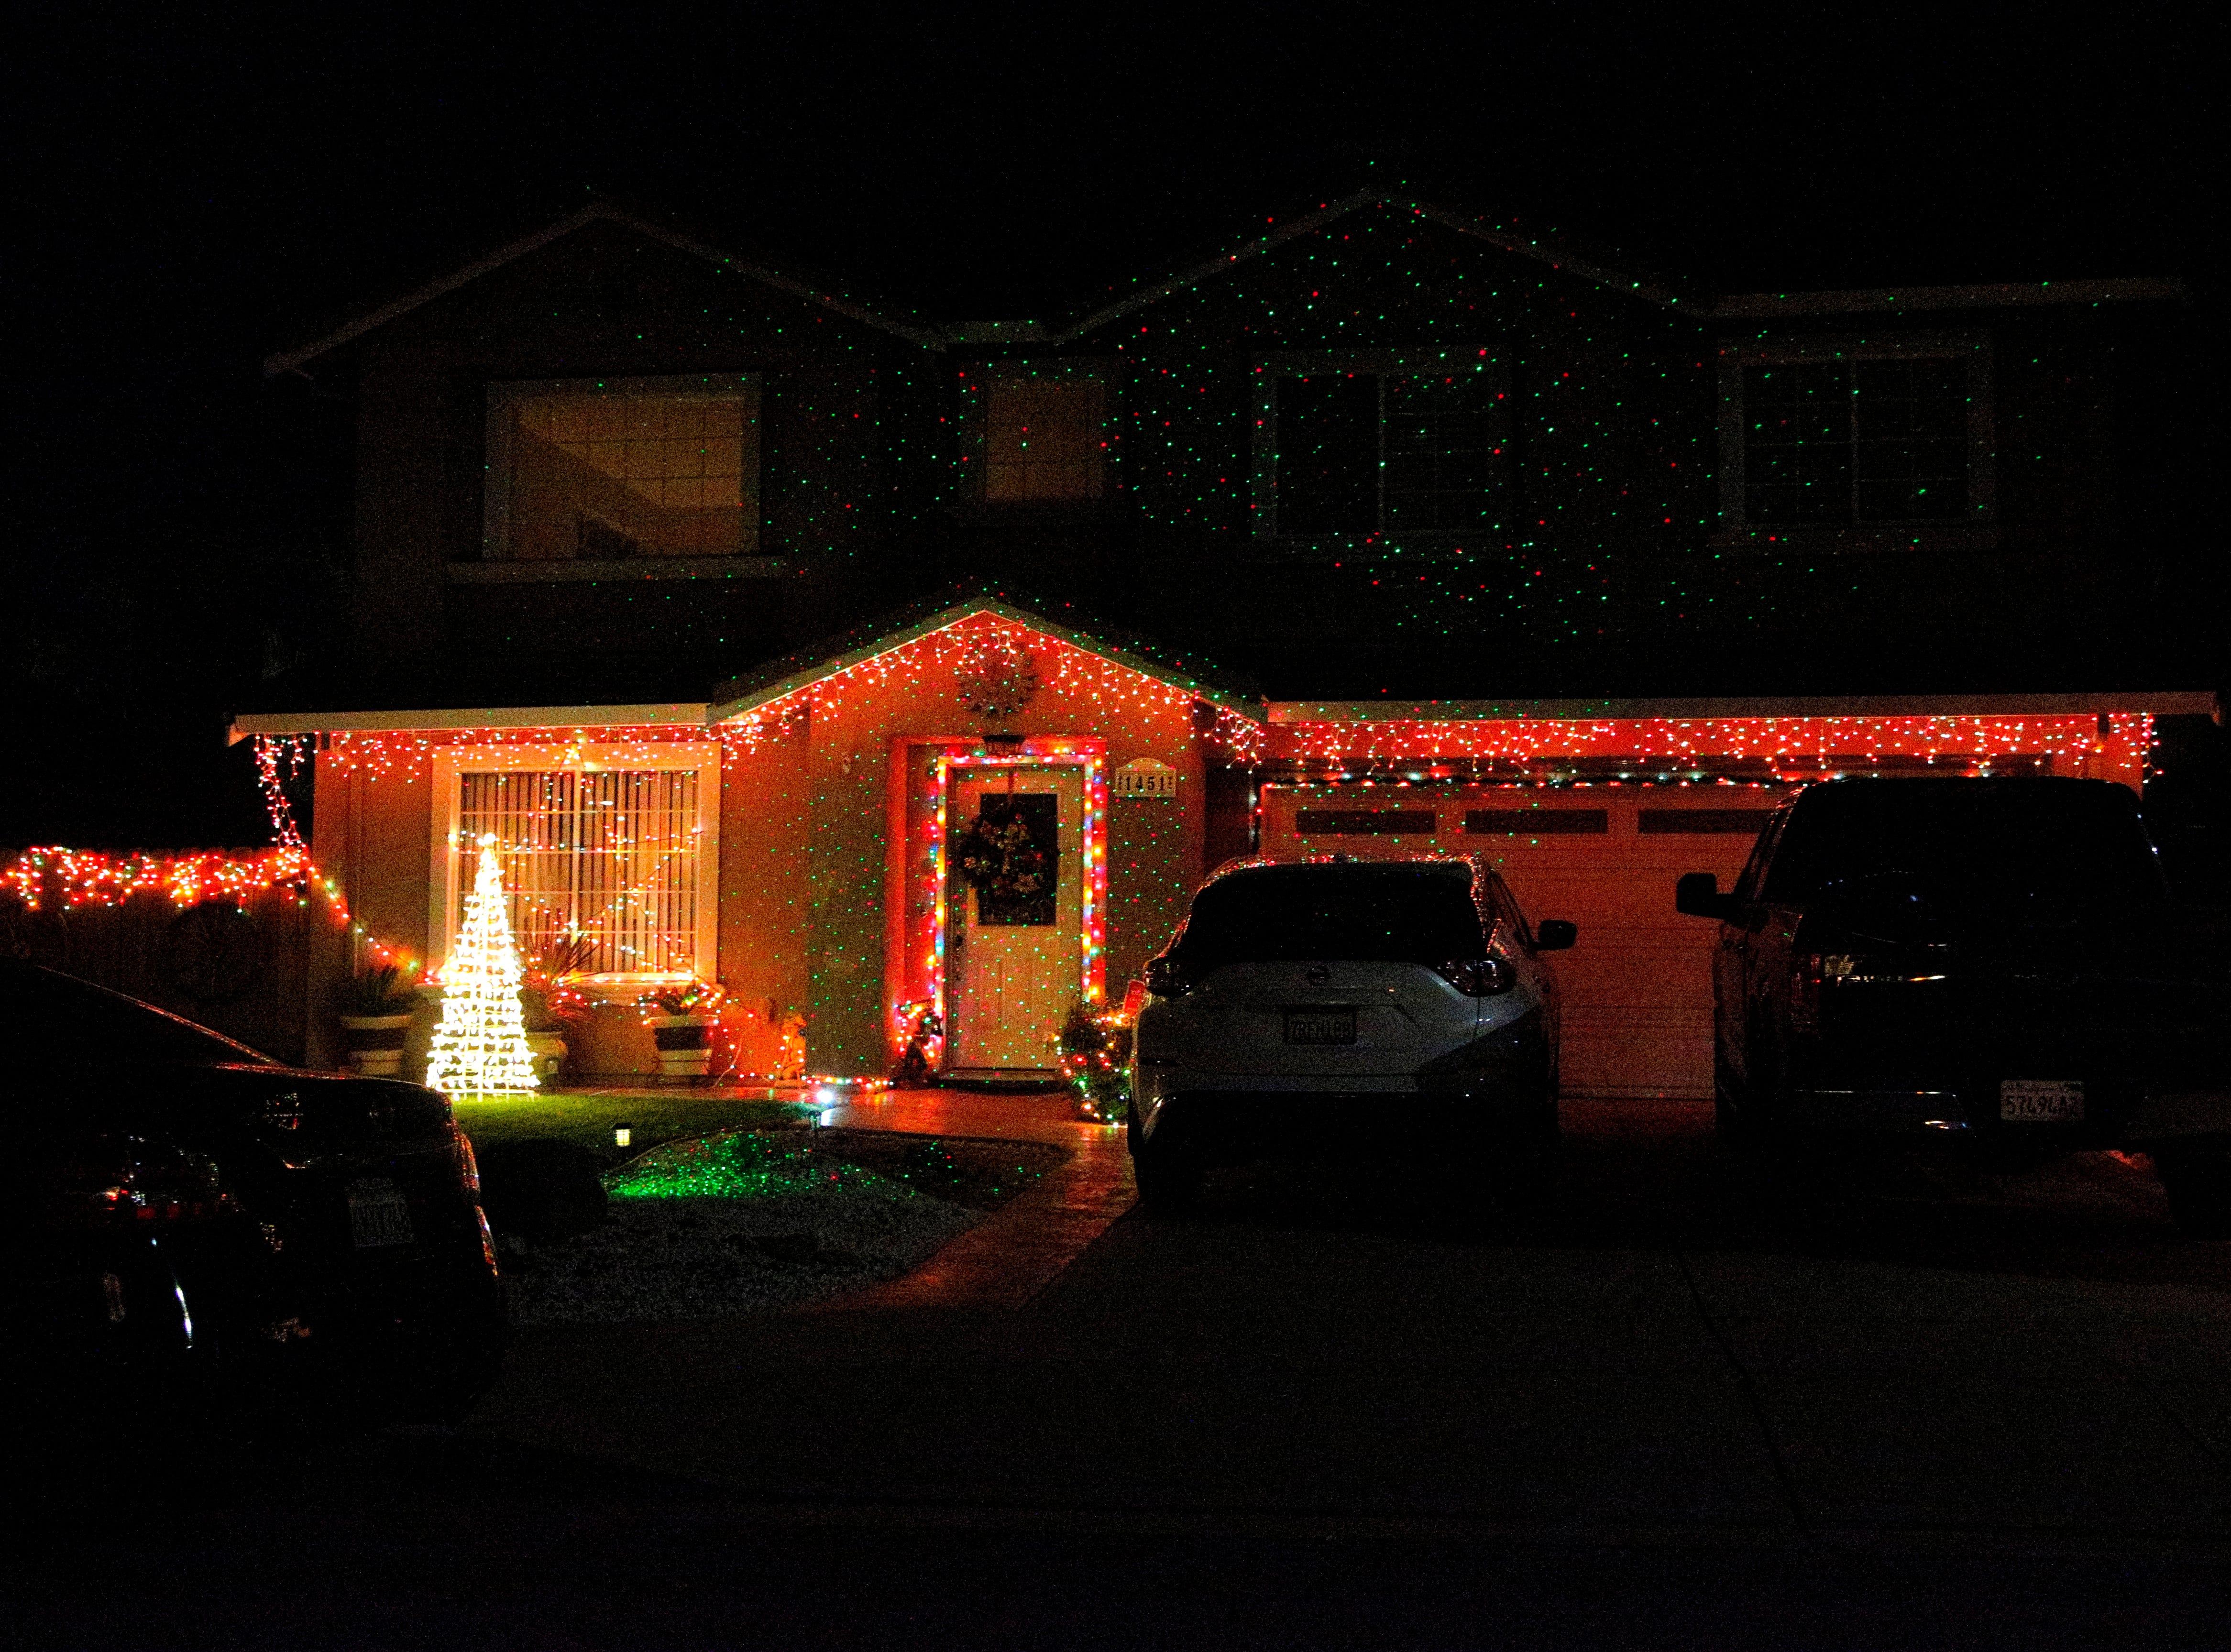 1451 Cougar Drive in Salinas